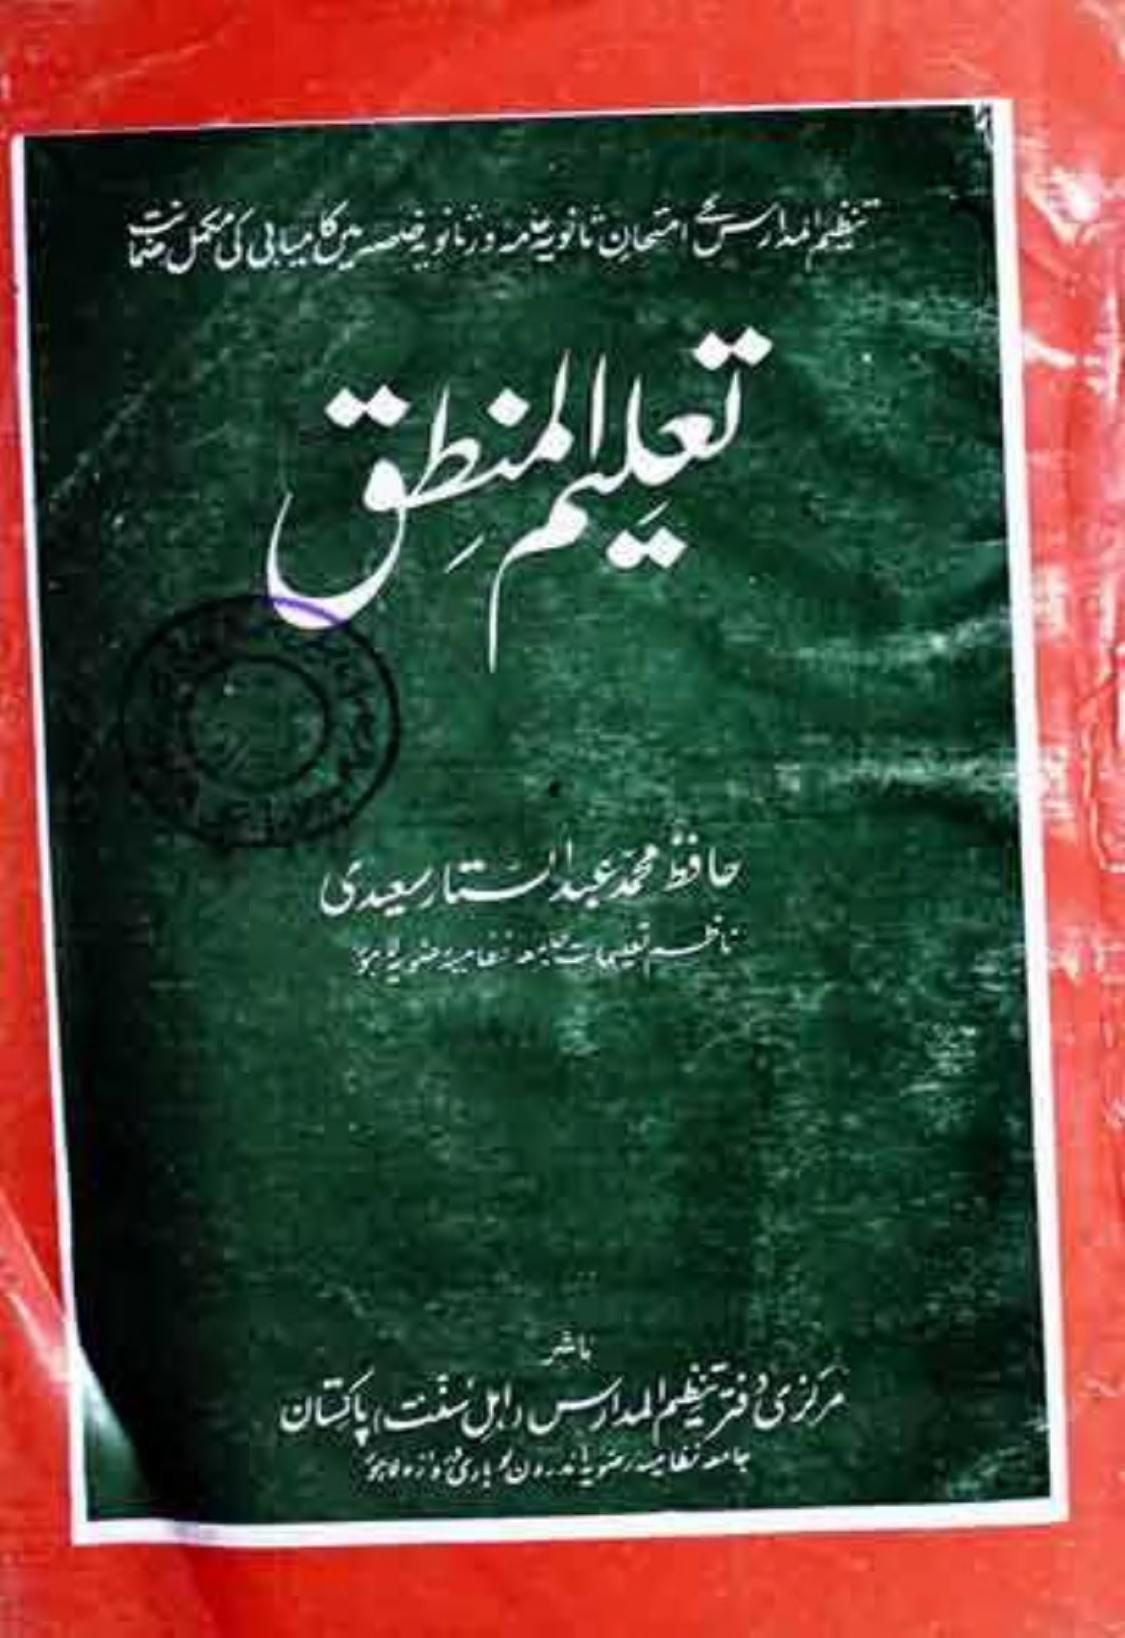 Taleem Ul Mantaiq تعلیم المنطق M Awais Sultan Free Download Borrow And Streaming Internet Archive Ebooks Free Books Free Ebooks Download Books English Books Pdf